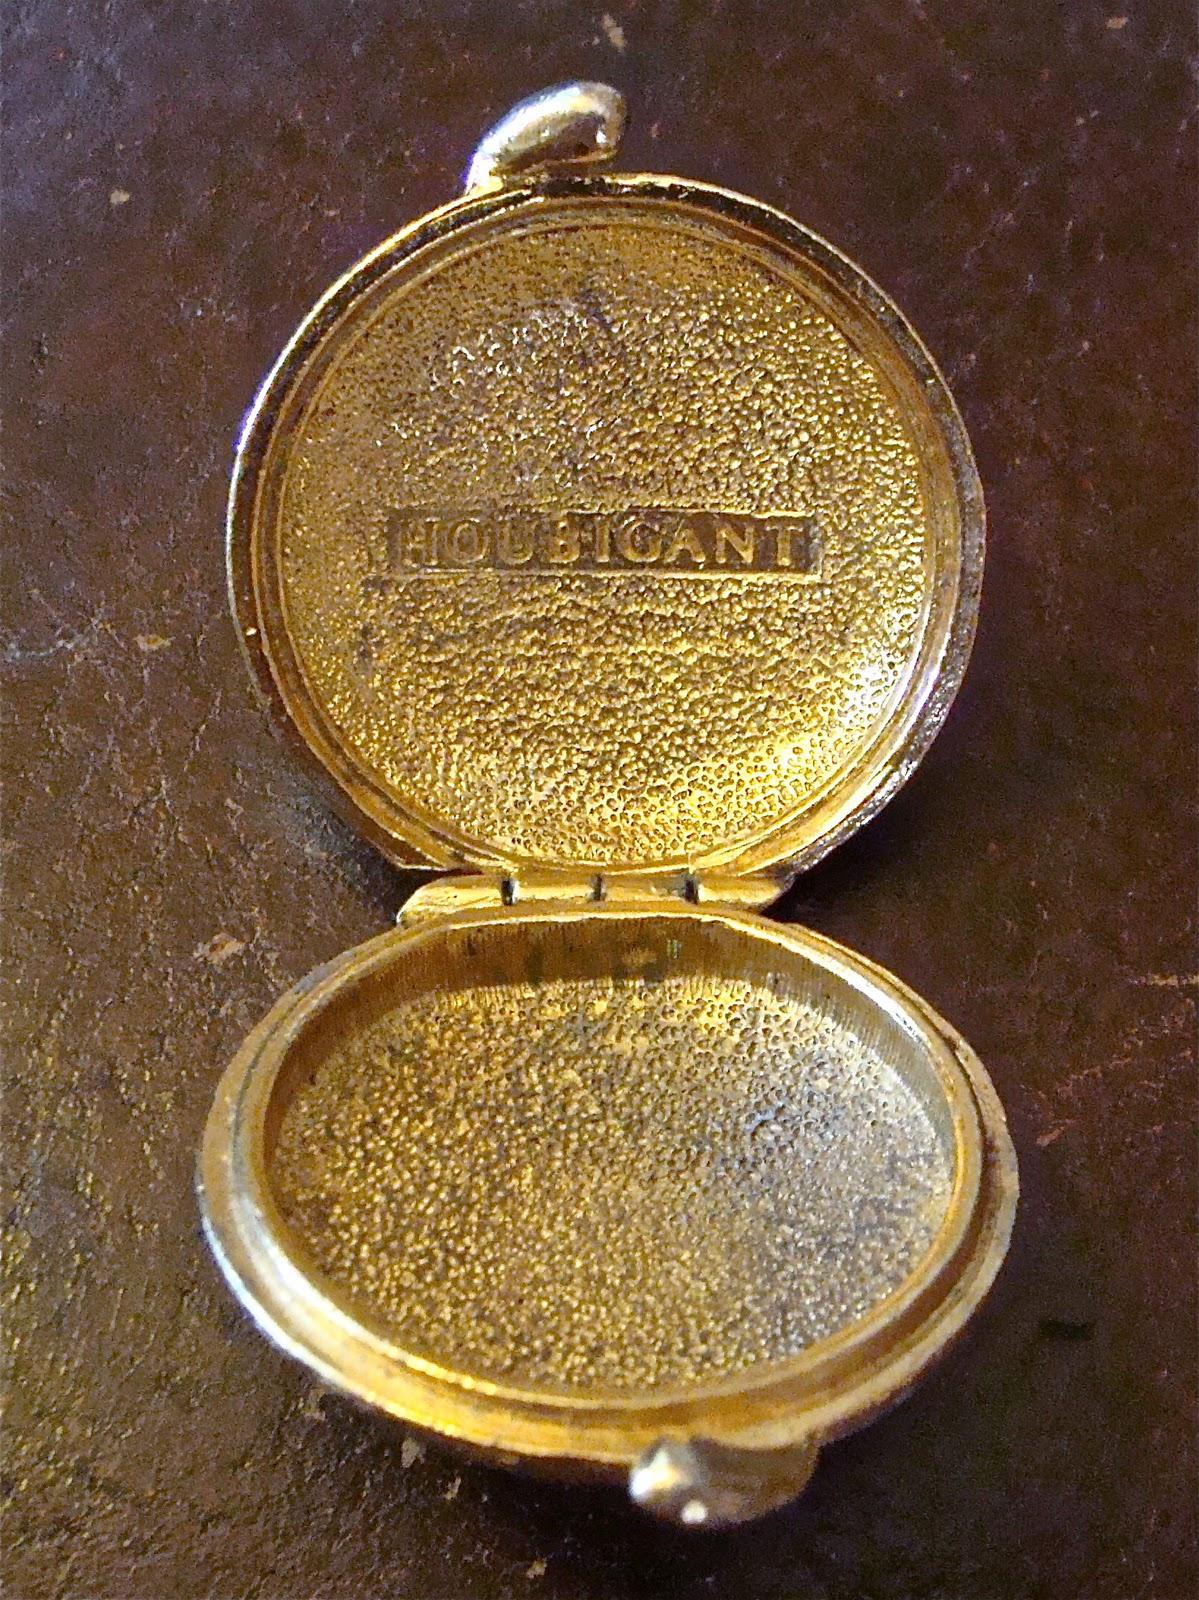 Whitny Braun Vintage Houbigant Perfume Compact